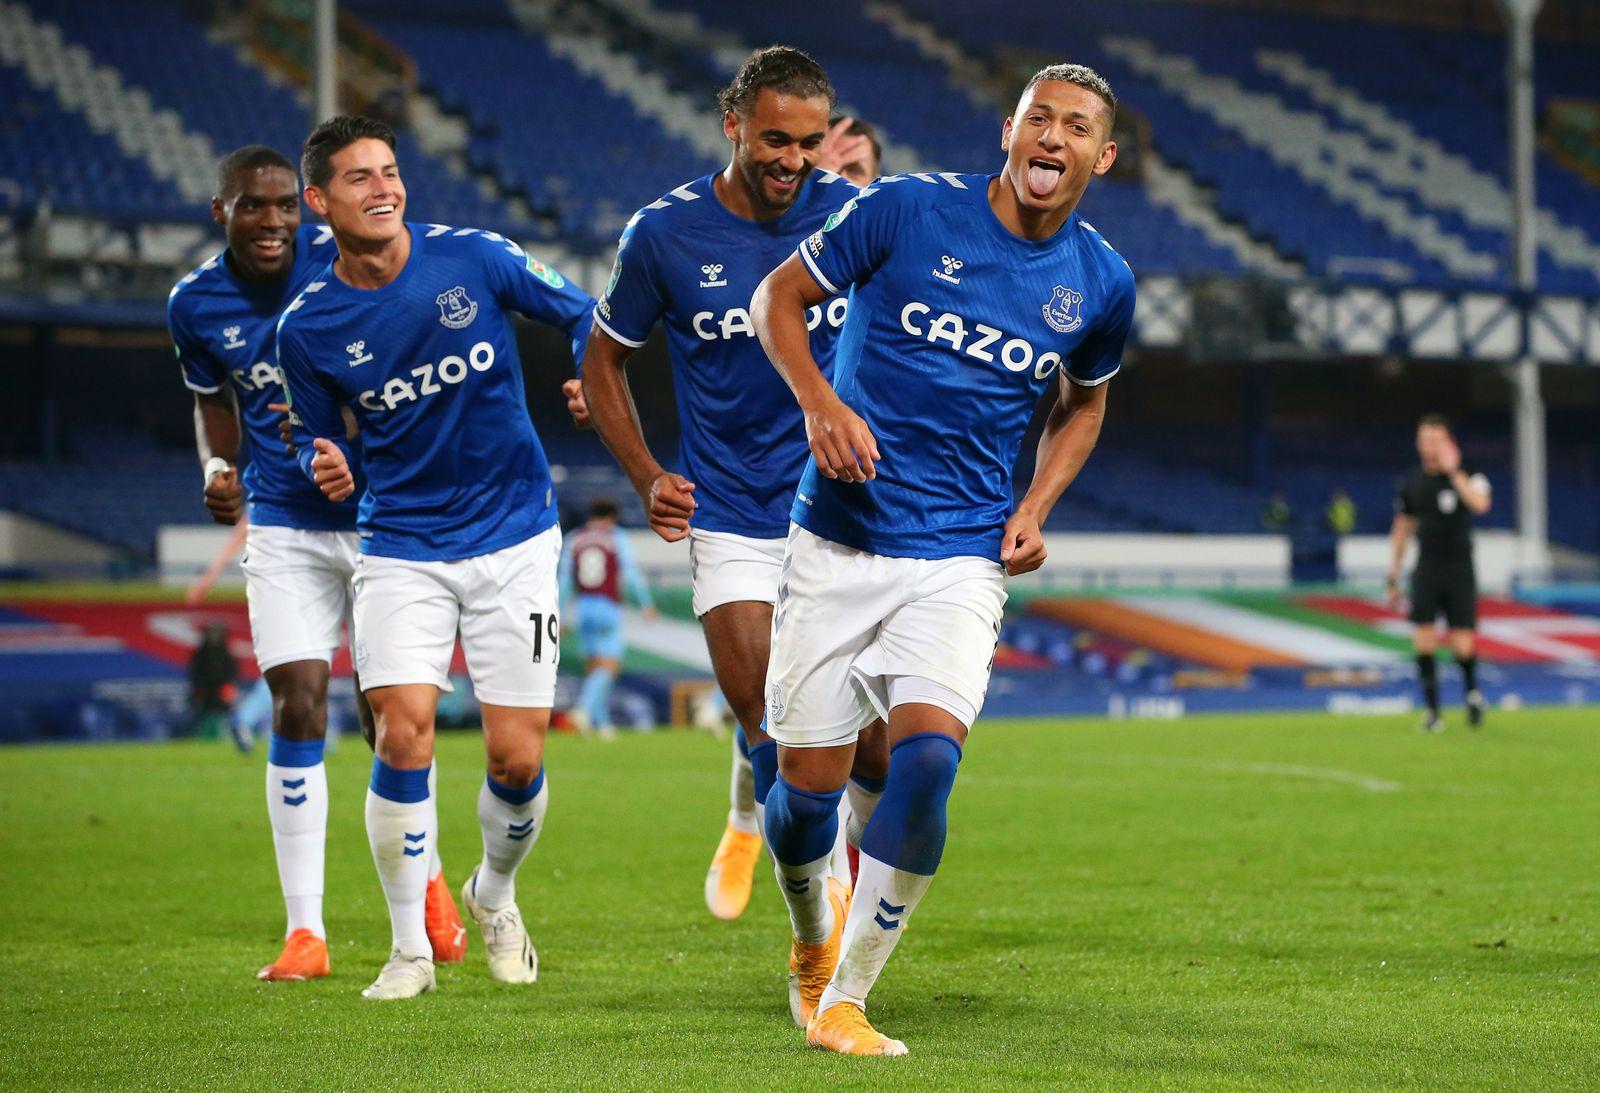 Everton v West Ham United - Carabao Cup Fourth Round